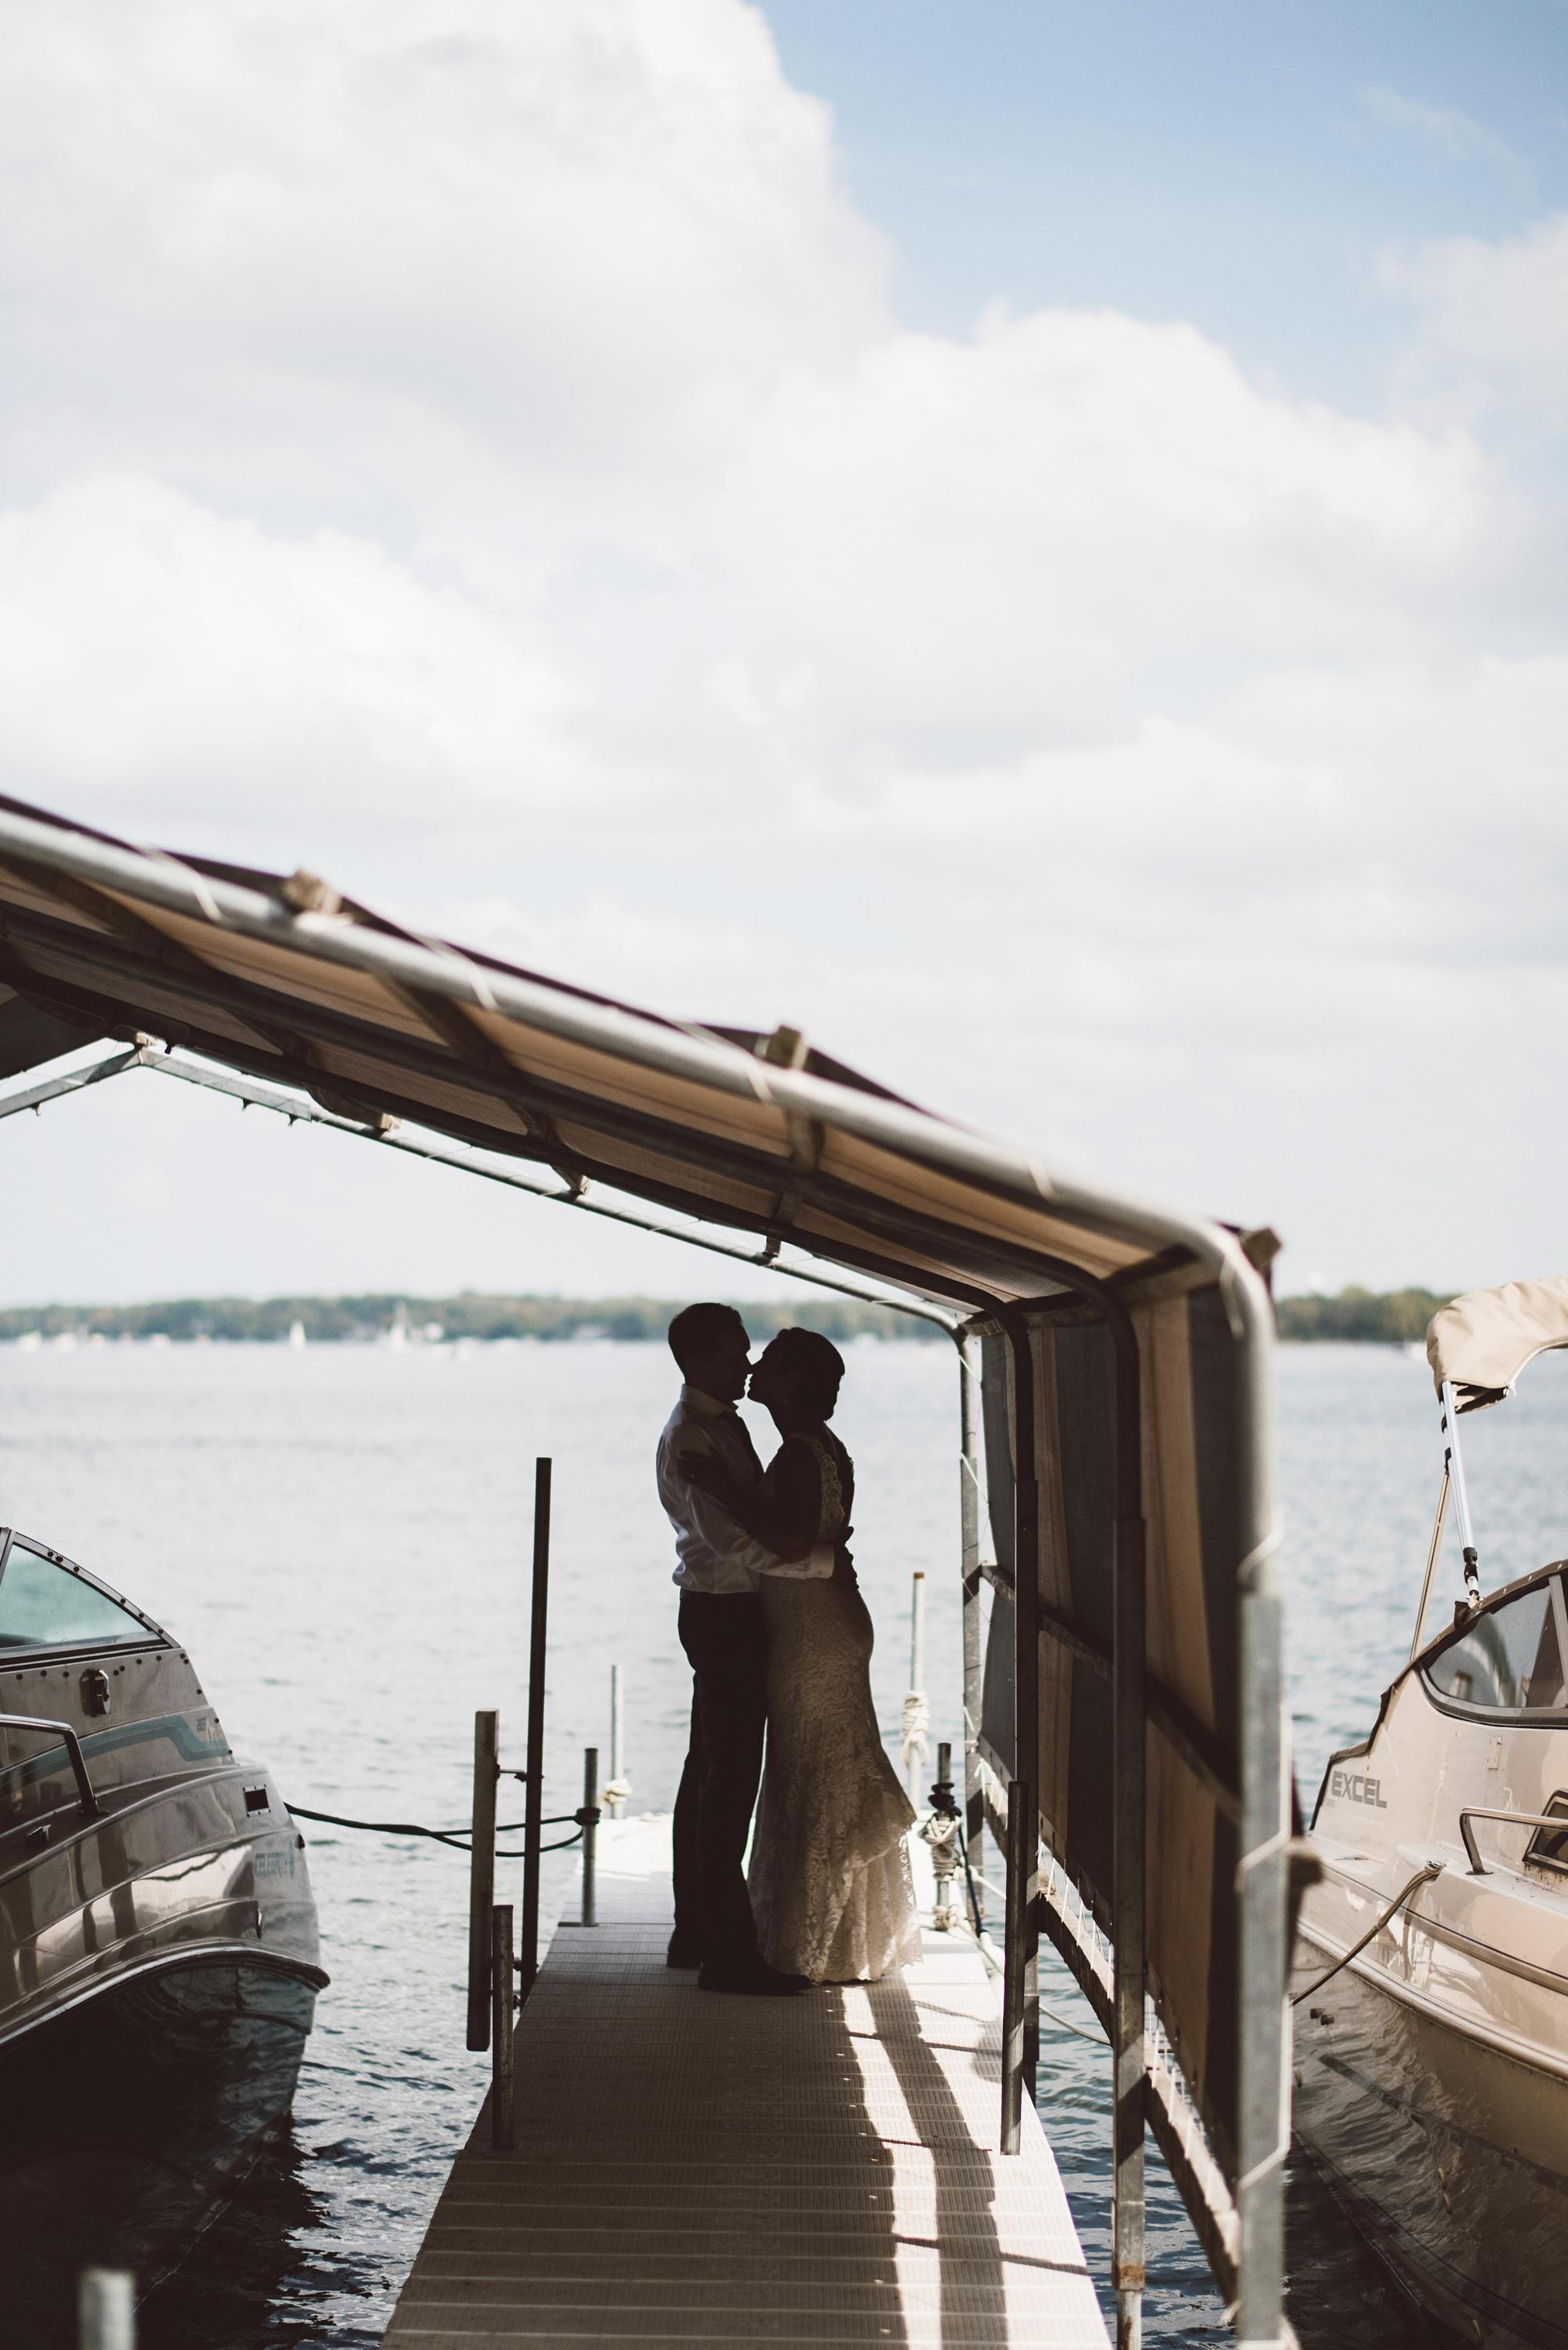 best_wedding_photography_2017_by_lucas_botz_photography_189.jpg